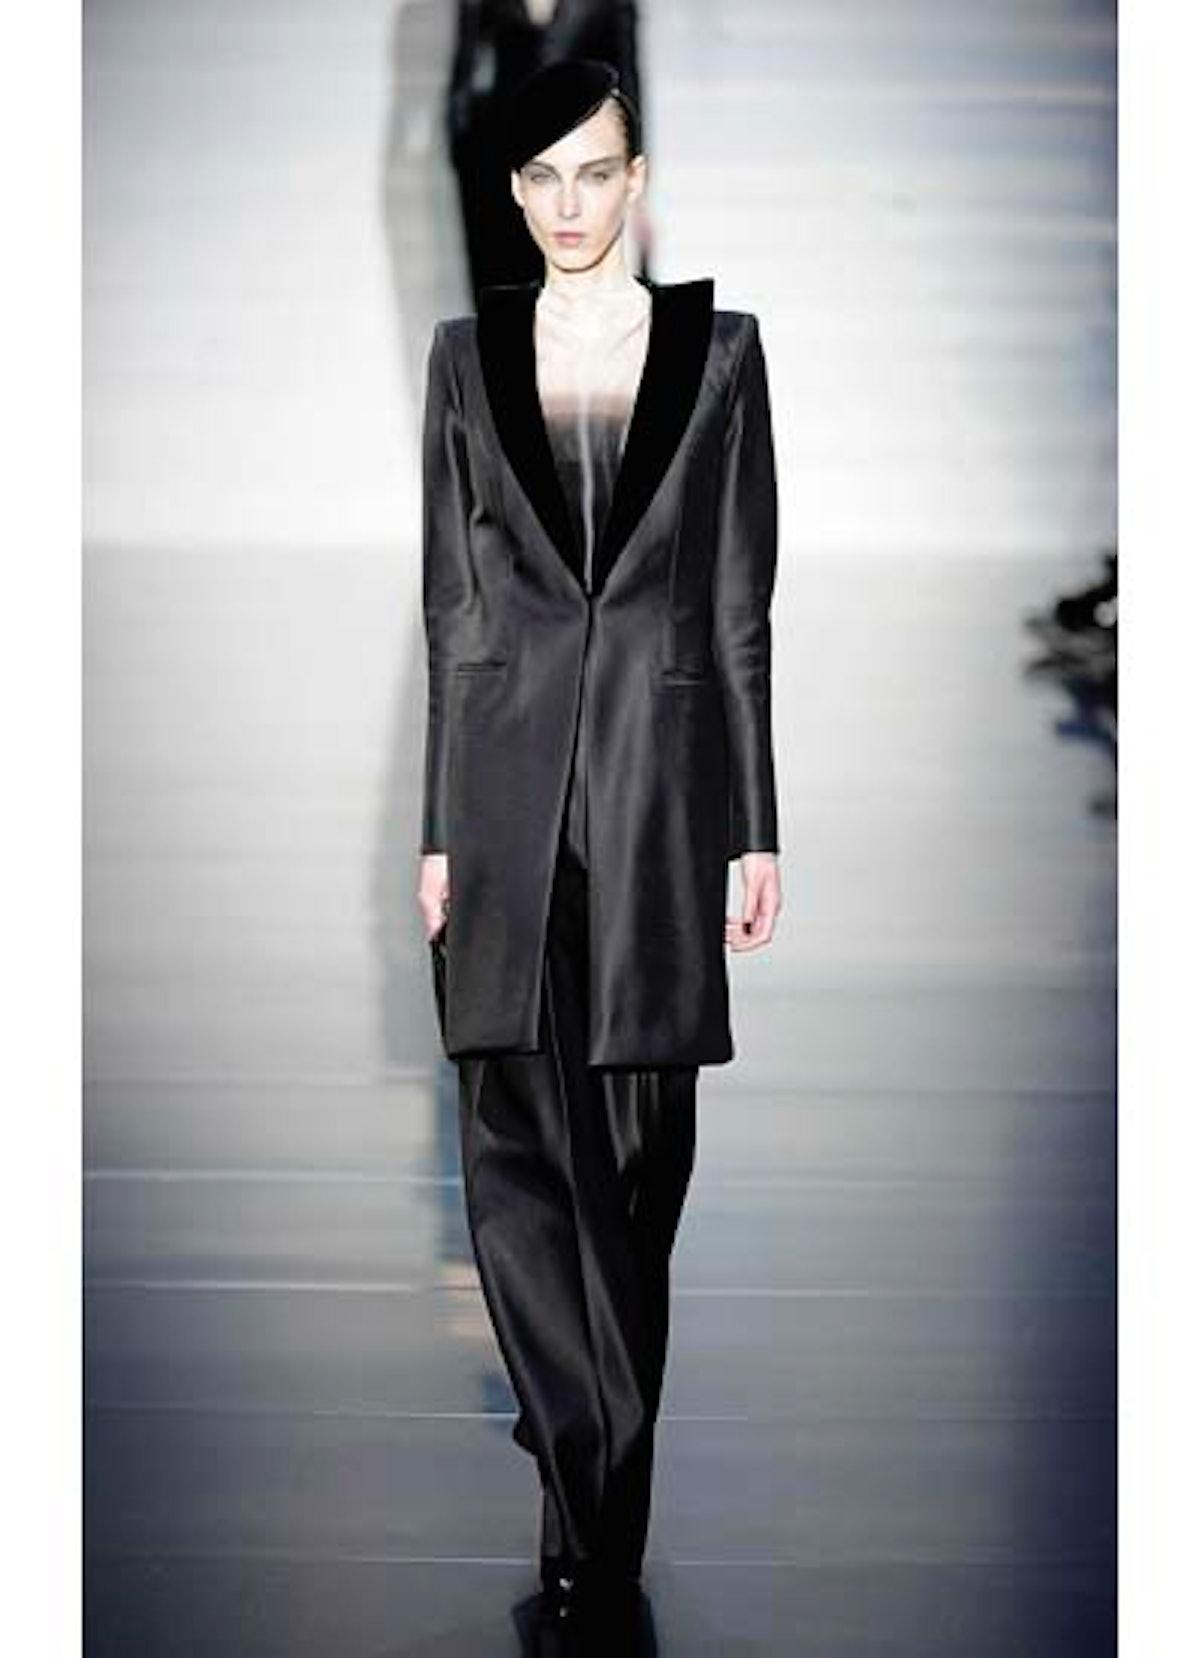 fass-giorgio-armani-couture-2012-runway-08-v.jpg